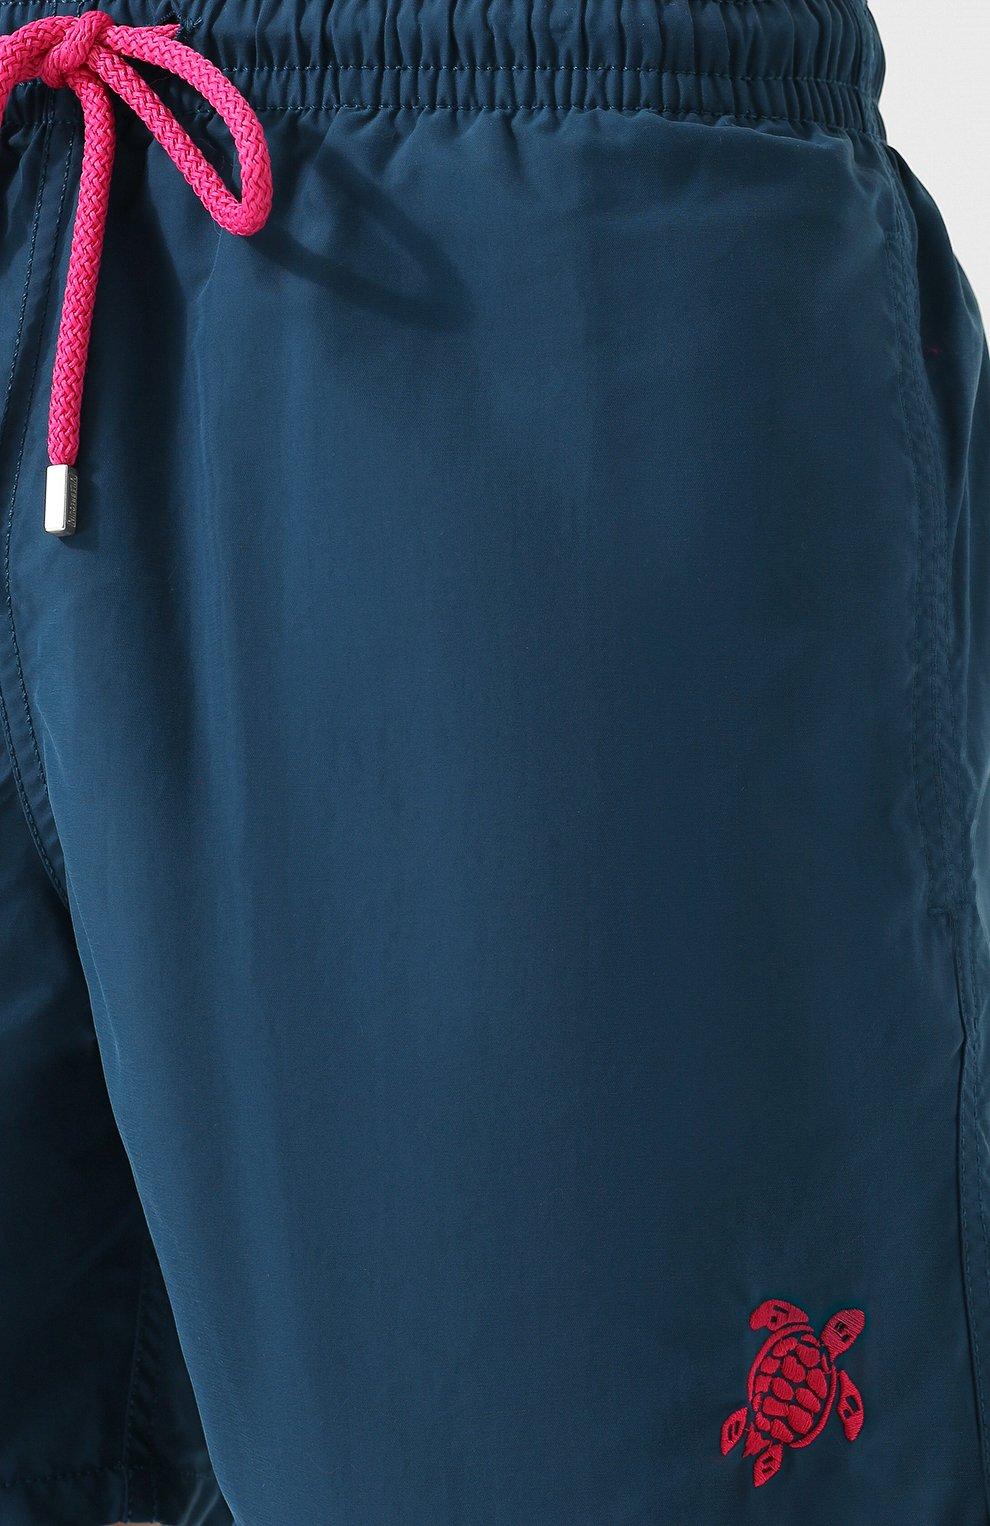 Плавки-шорты с карманами | Фото №5